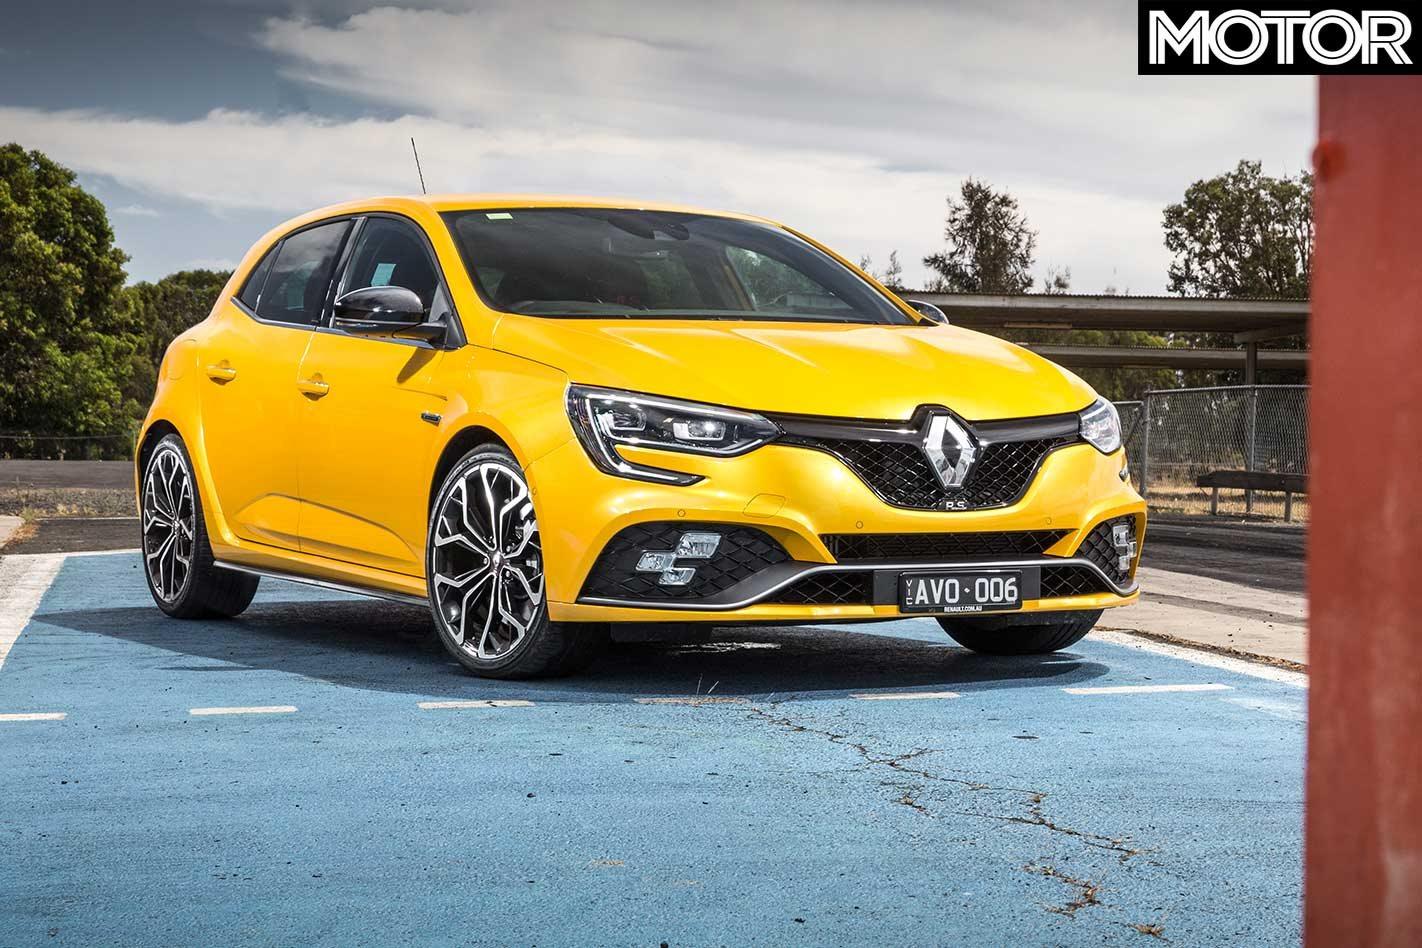 2019 Renault Megane RS280 vs Volkswagen Golf GTI comparison review